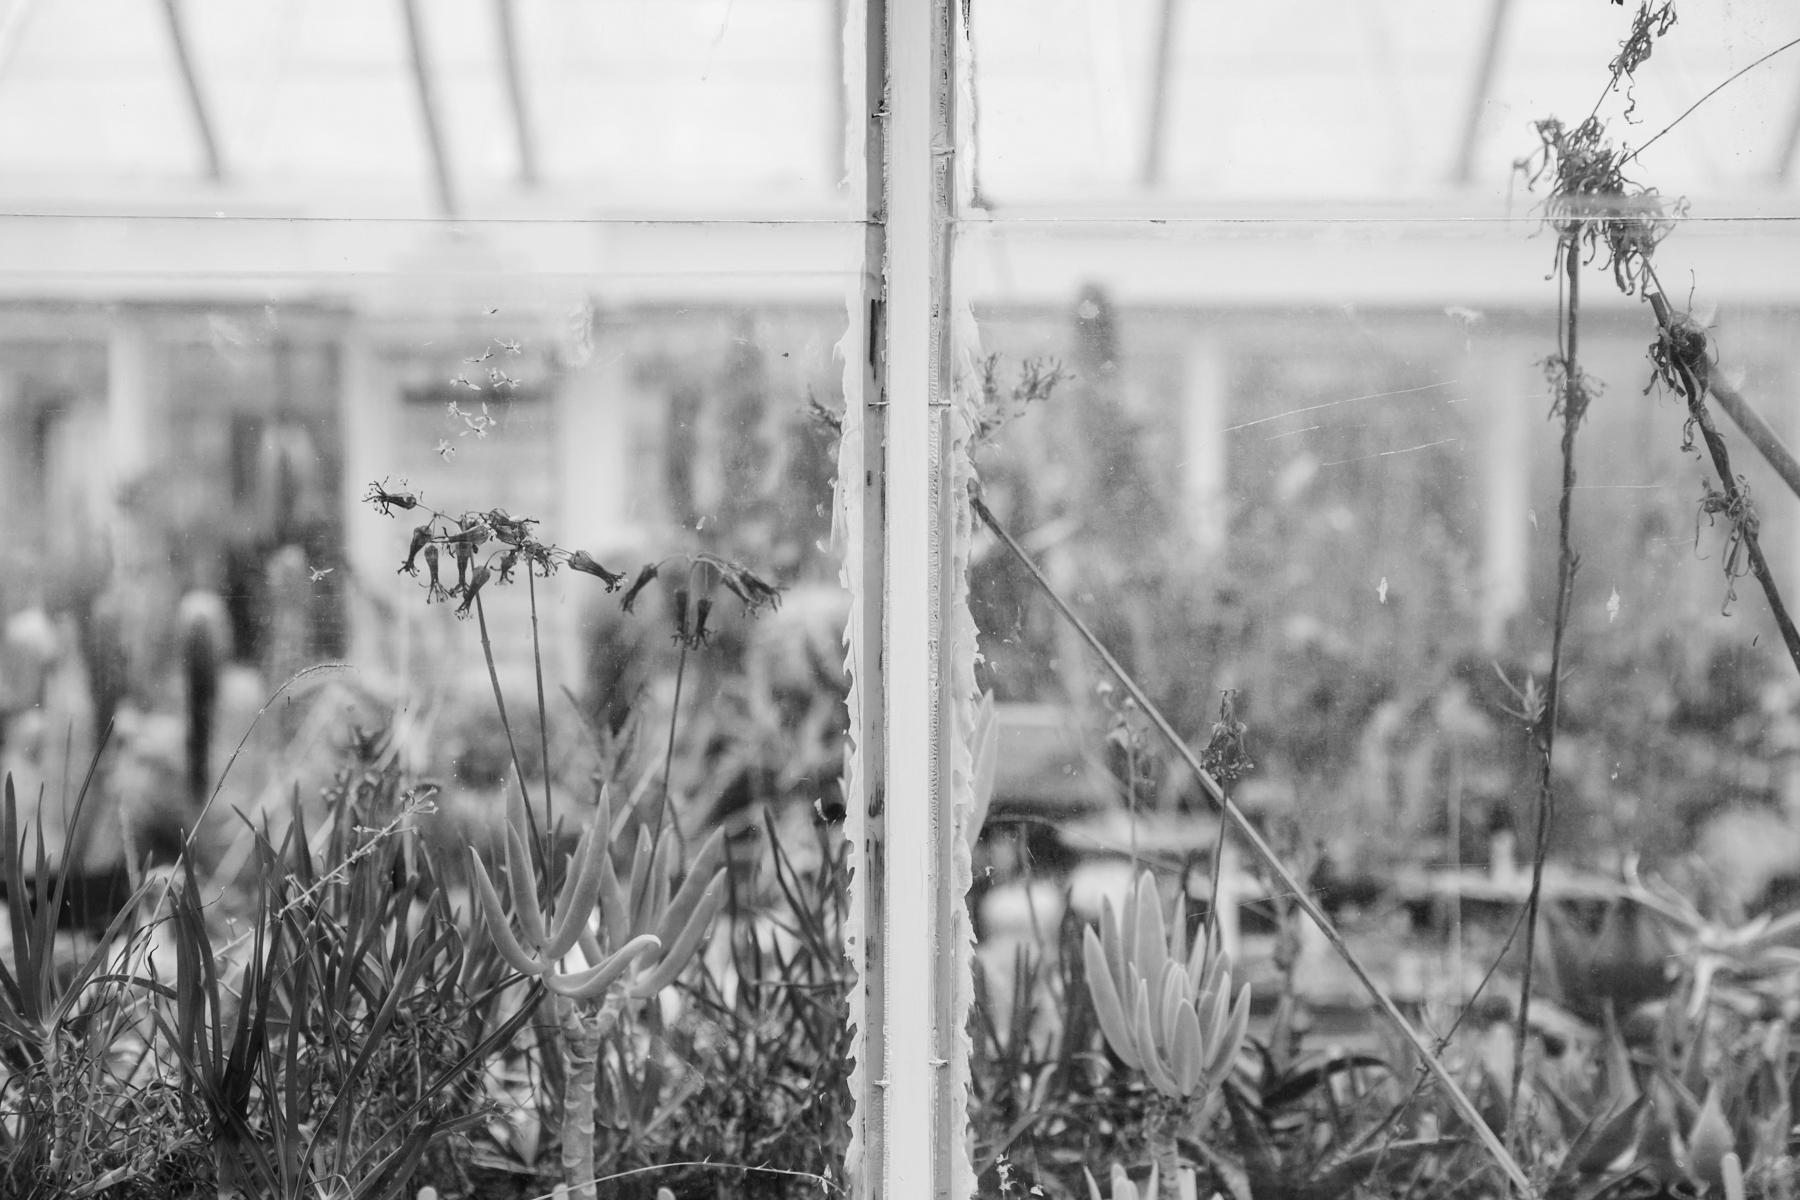 Plants through the greenhouse window